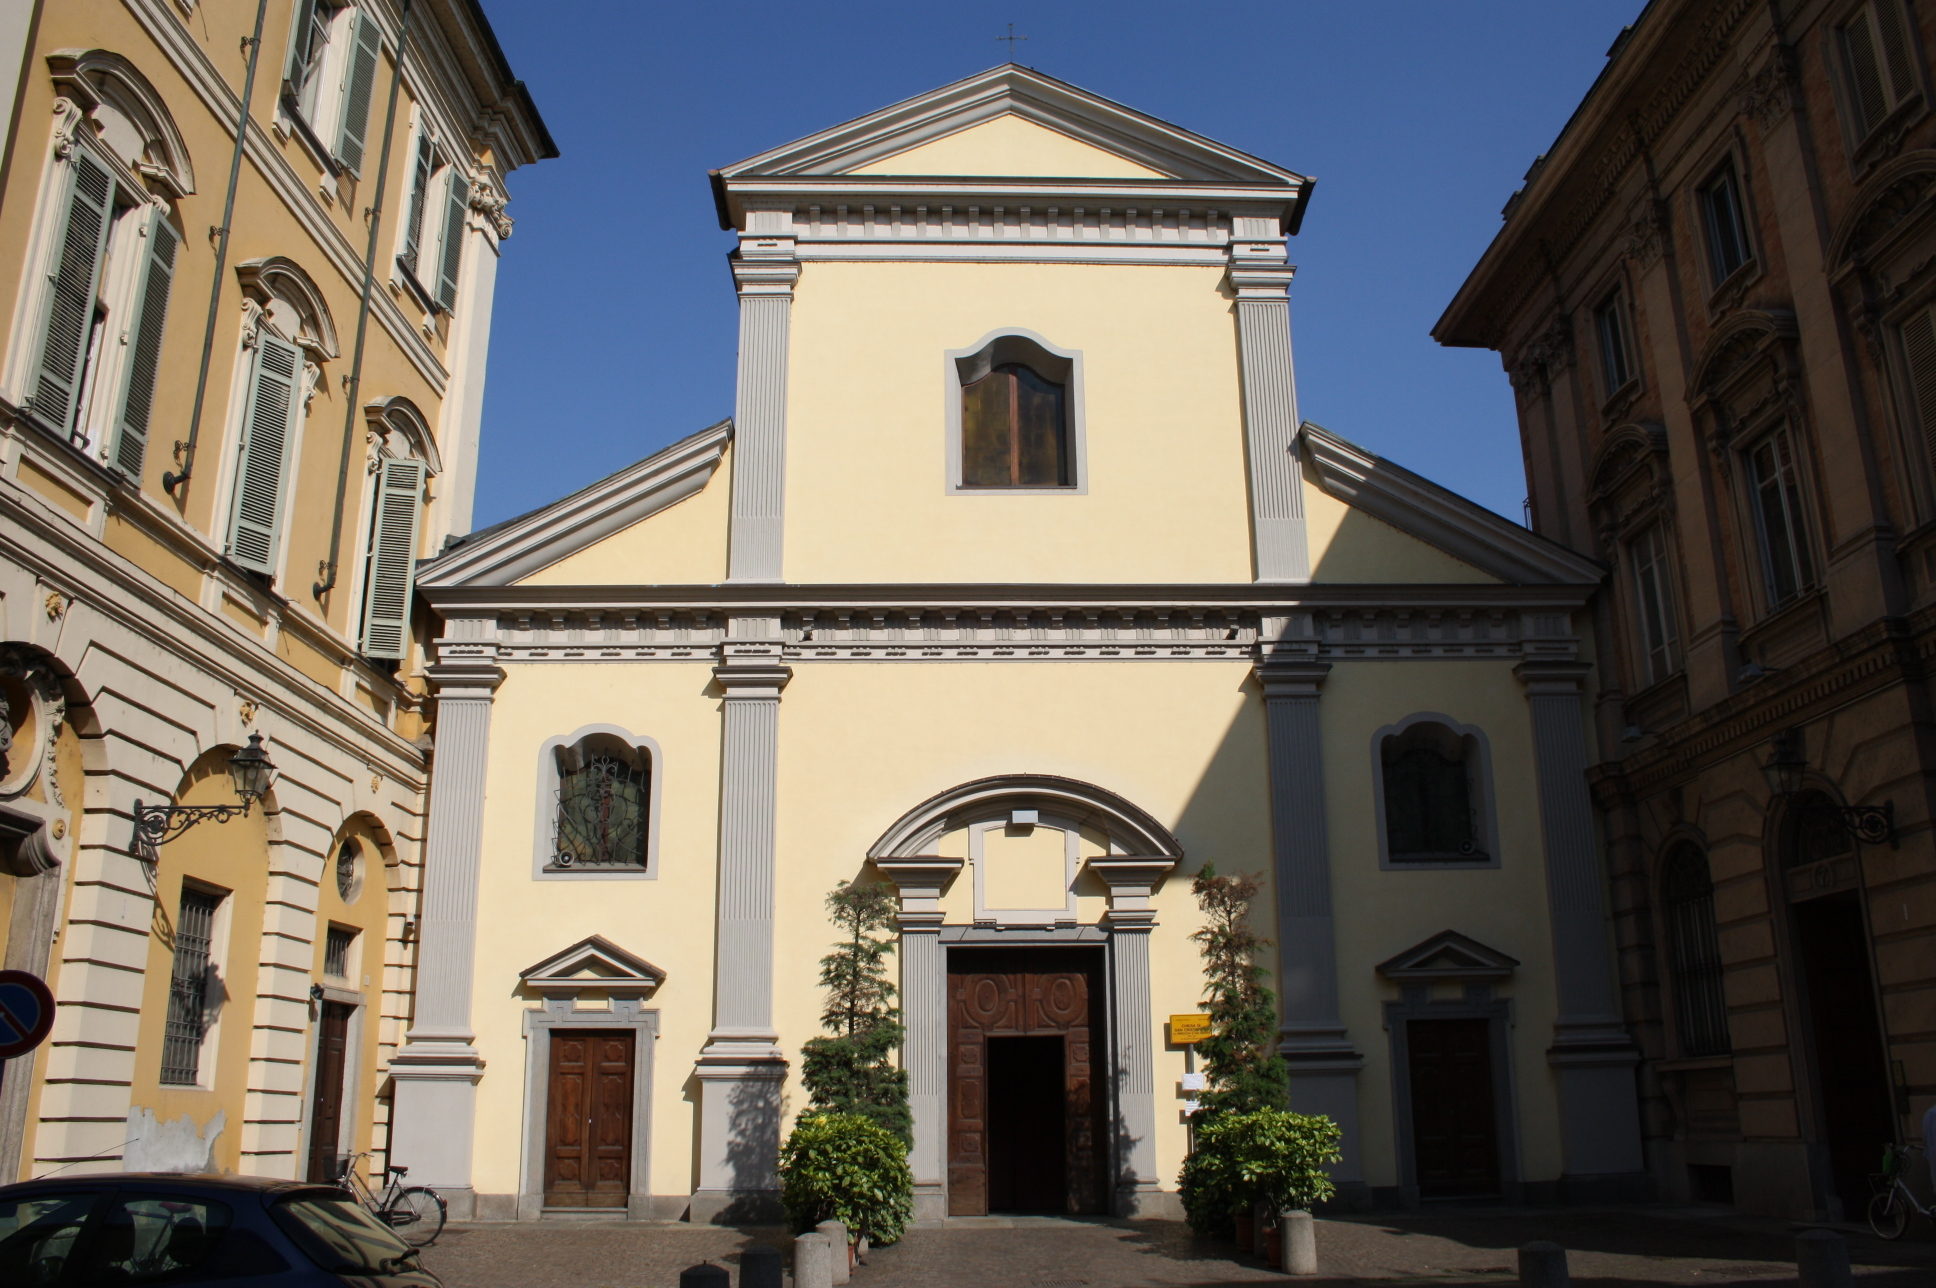 San Cristoforo Vercelli